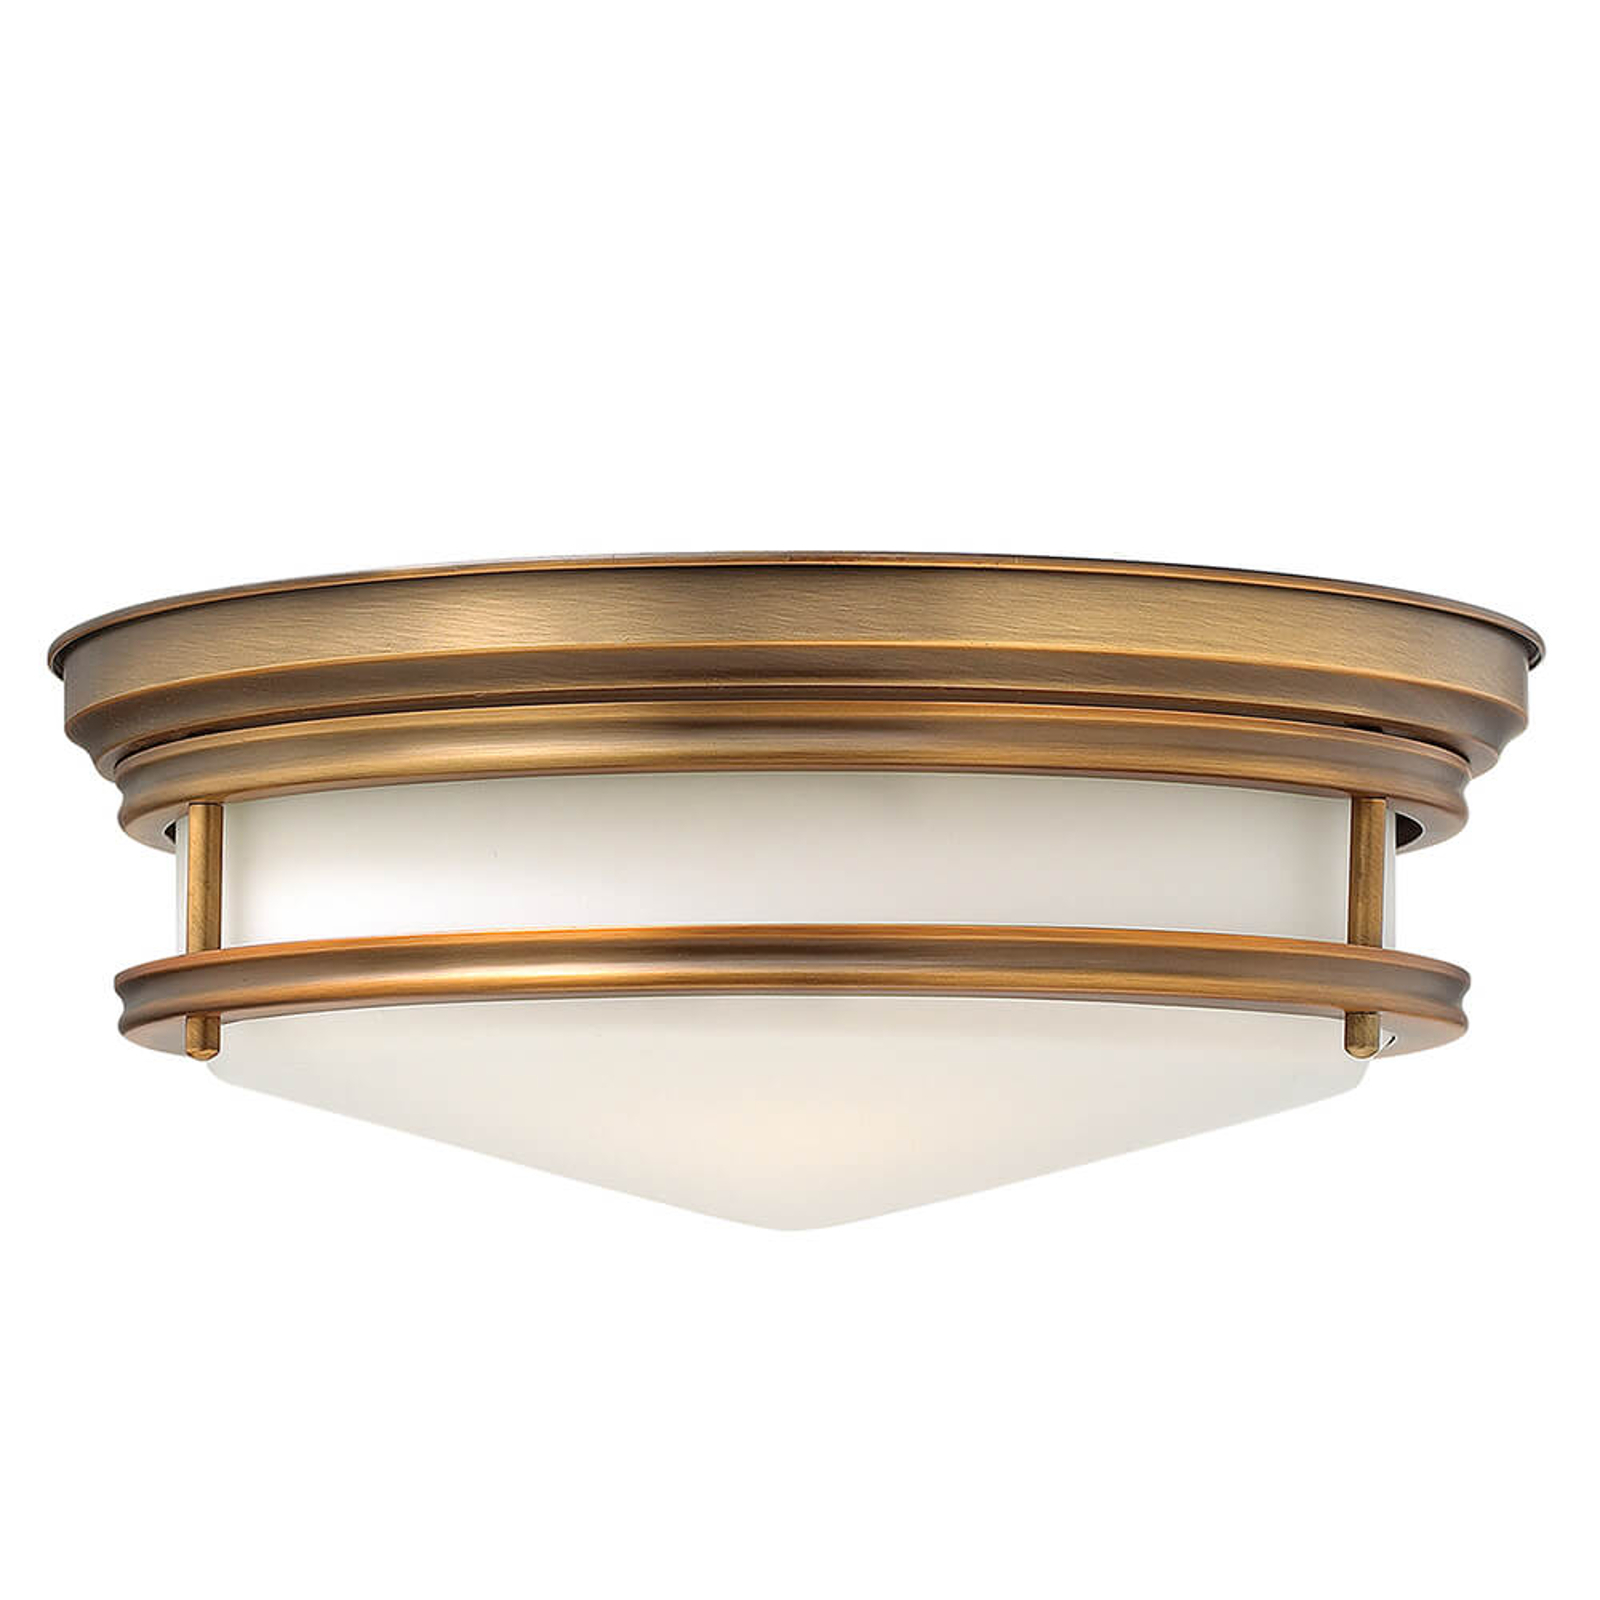 Plafondlamp Hadley geborsteld brons